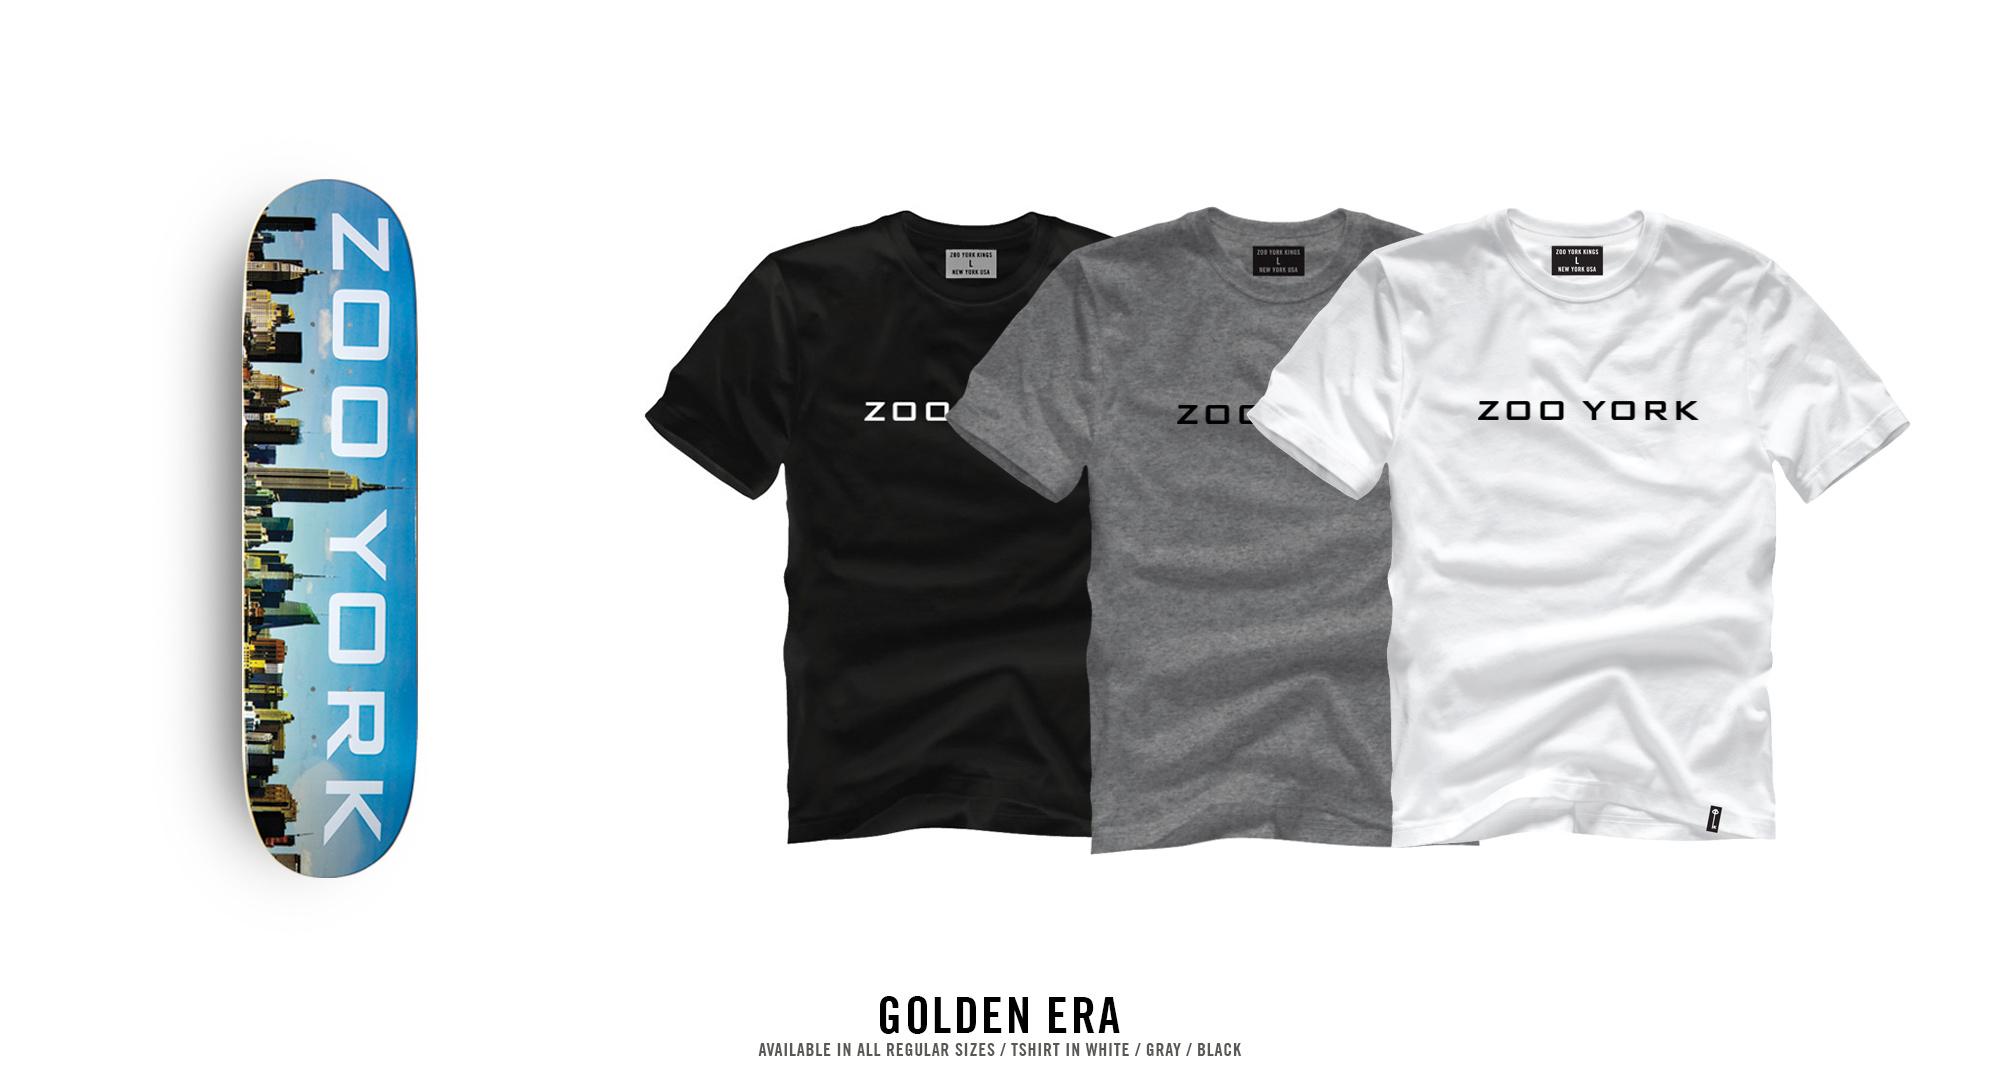 14-goldenera.jpg